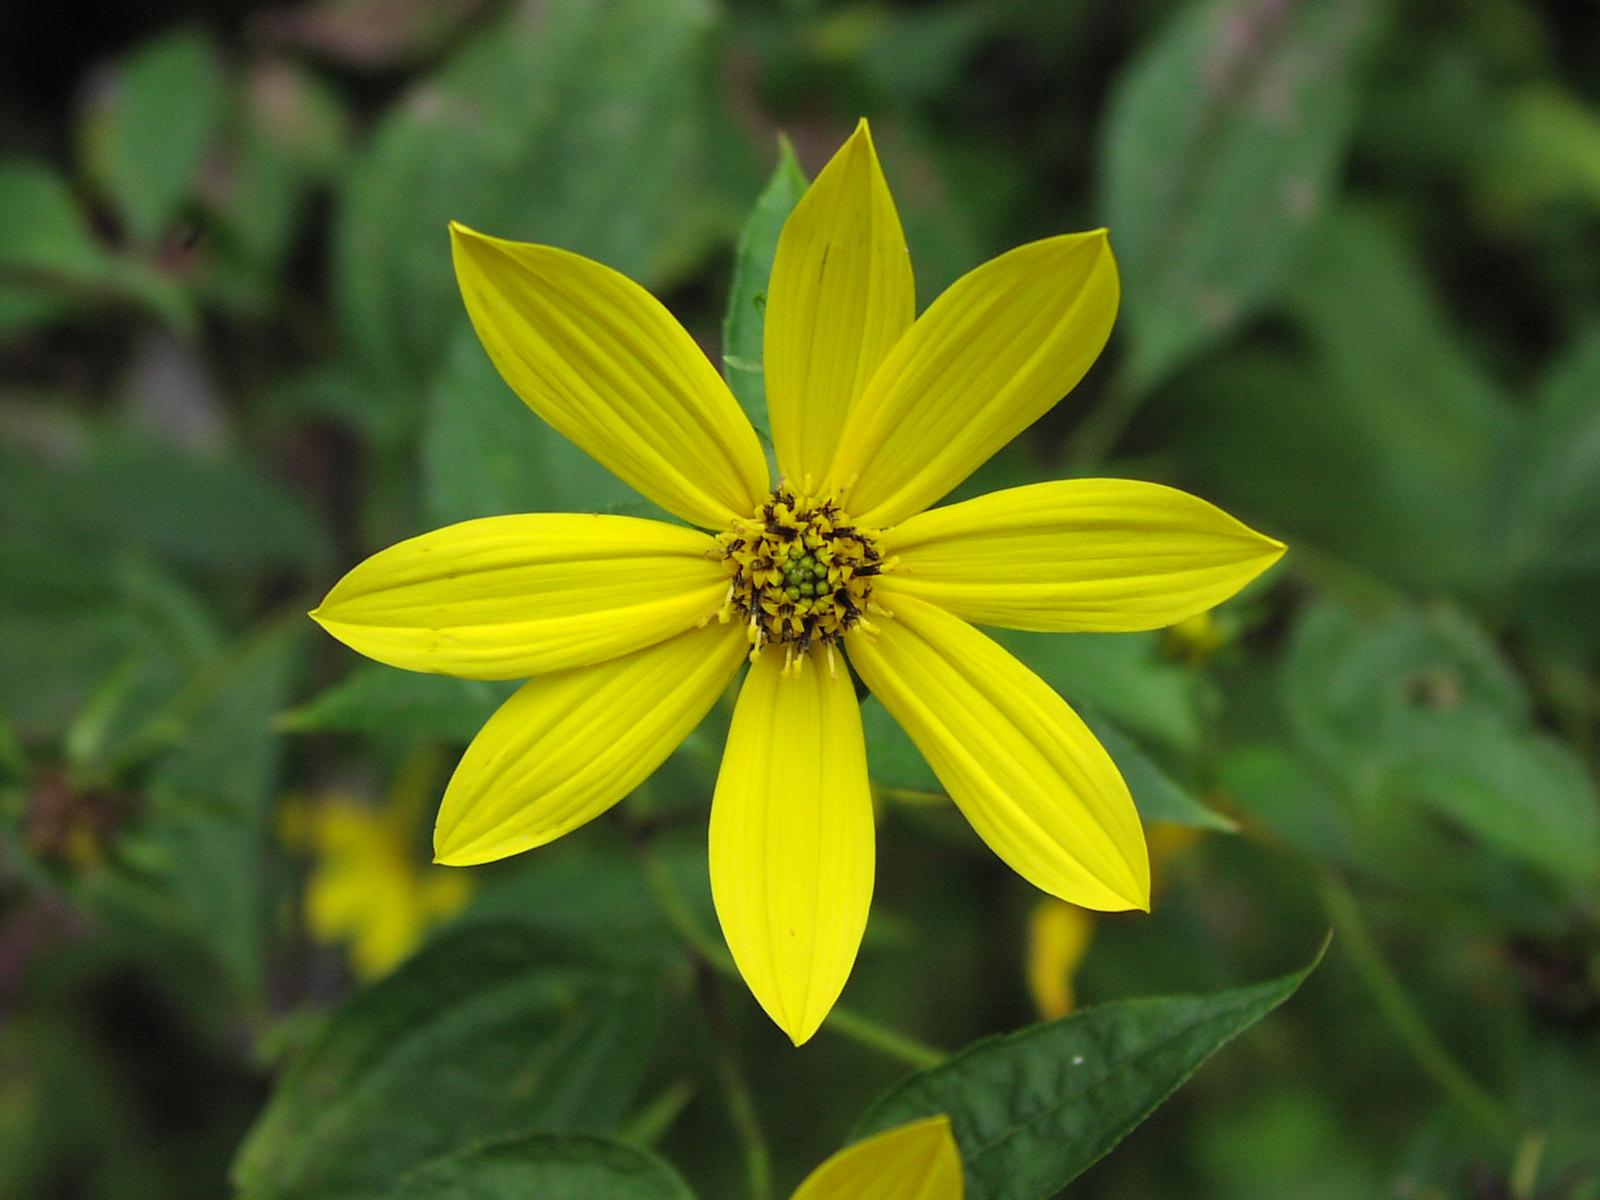 Bed e helianthus divaricata common name woodland sunflower izmirmasajfo